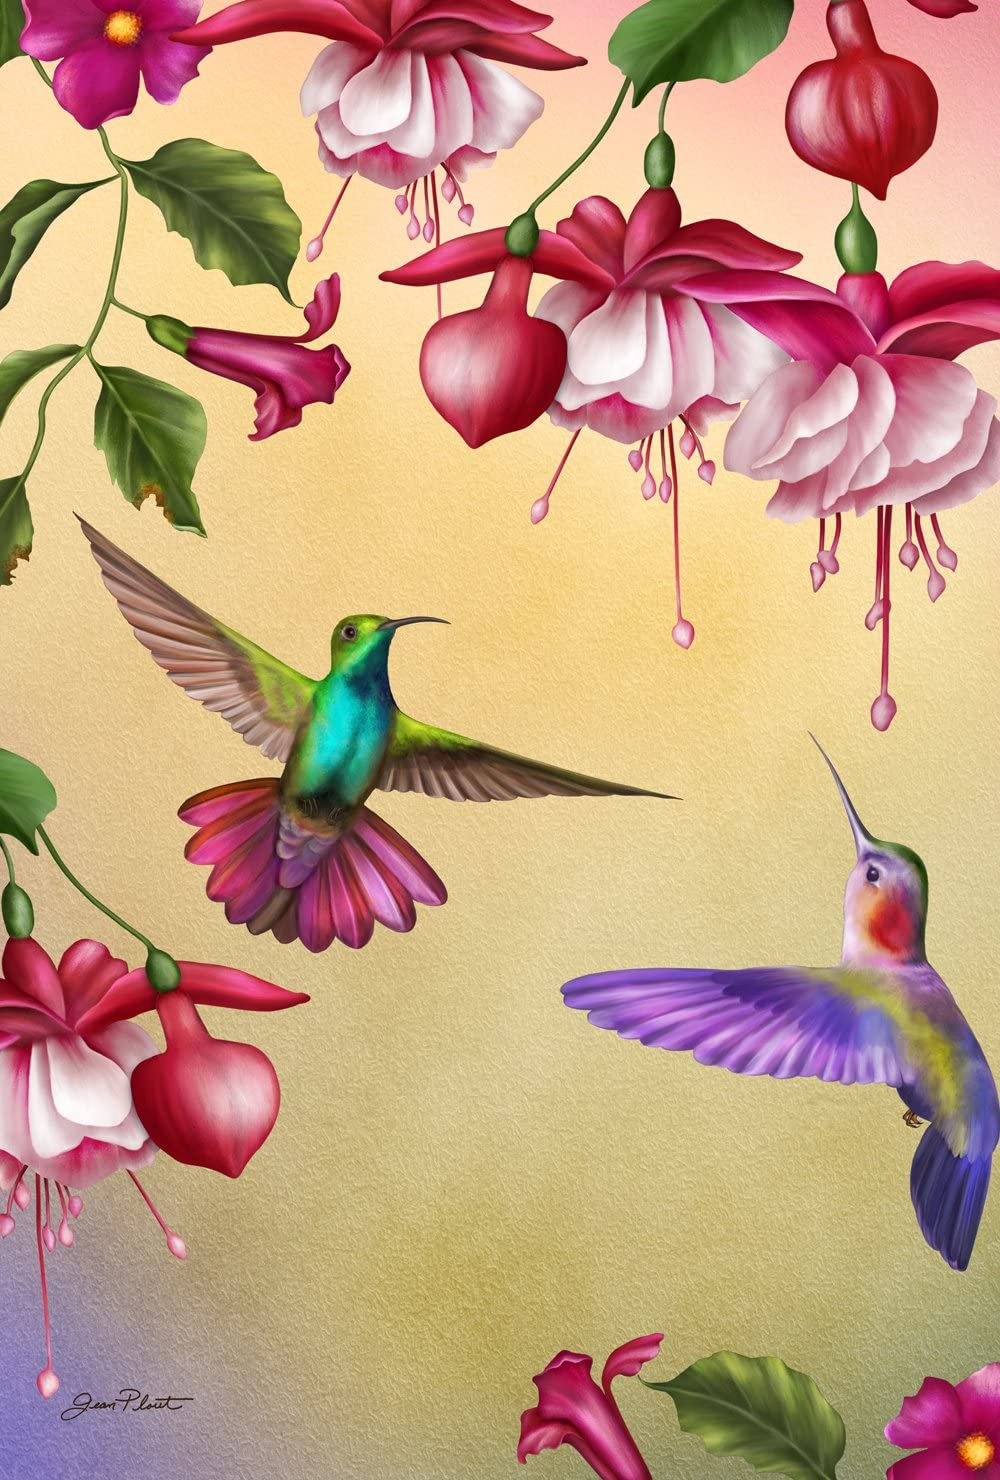 Amazon Com Toland Home Garden Thirsty Hummingbirds 12 5 X 18 Inch Decorative Colorful Spring Flower Flying Bird Garden Flag Garden Outdoor